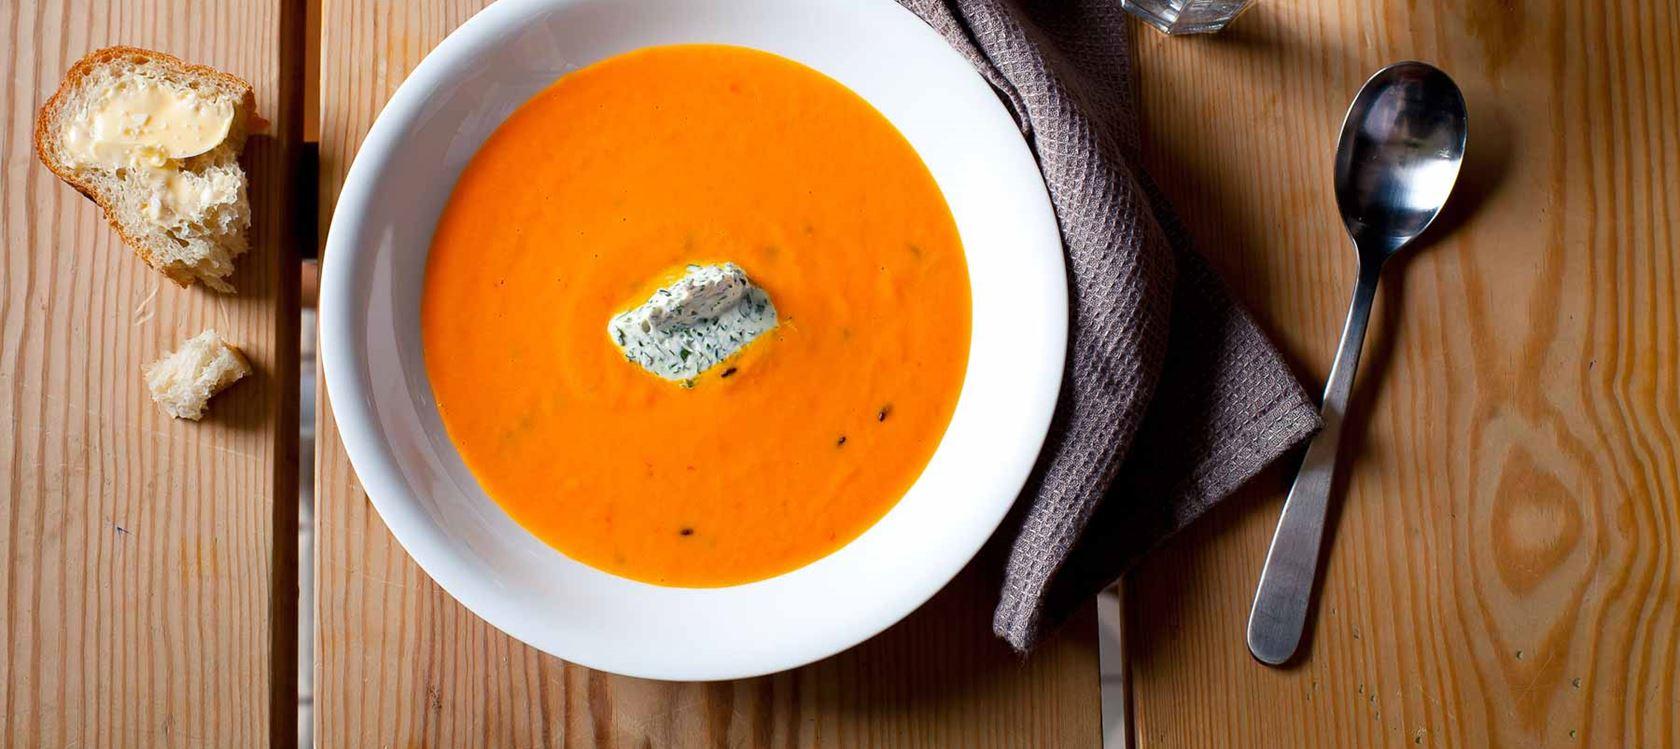 Chili-porkkanasosekeitto